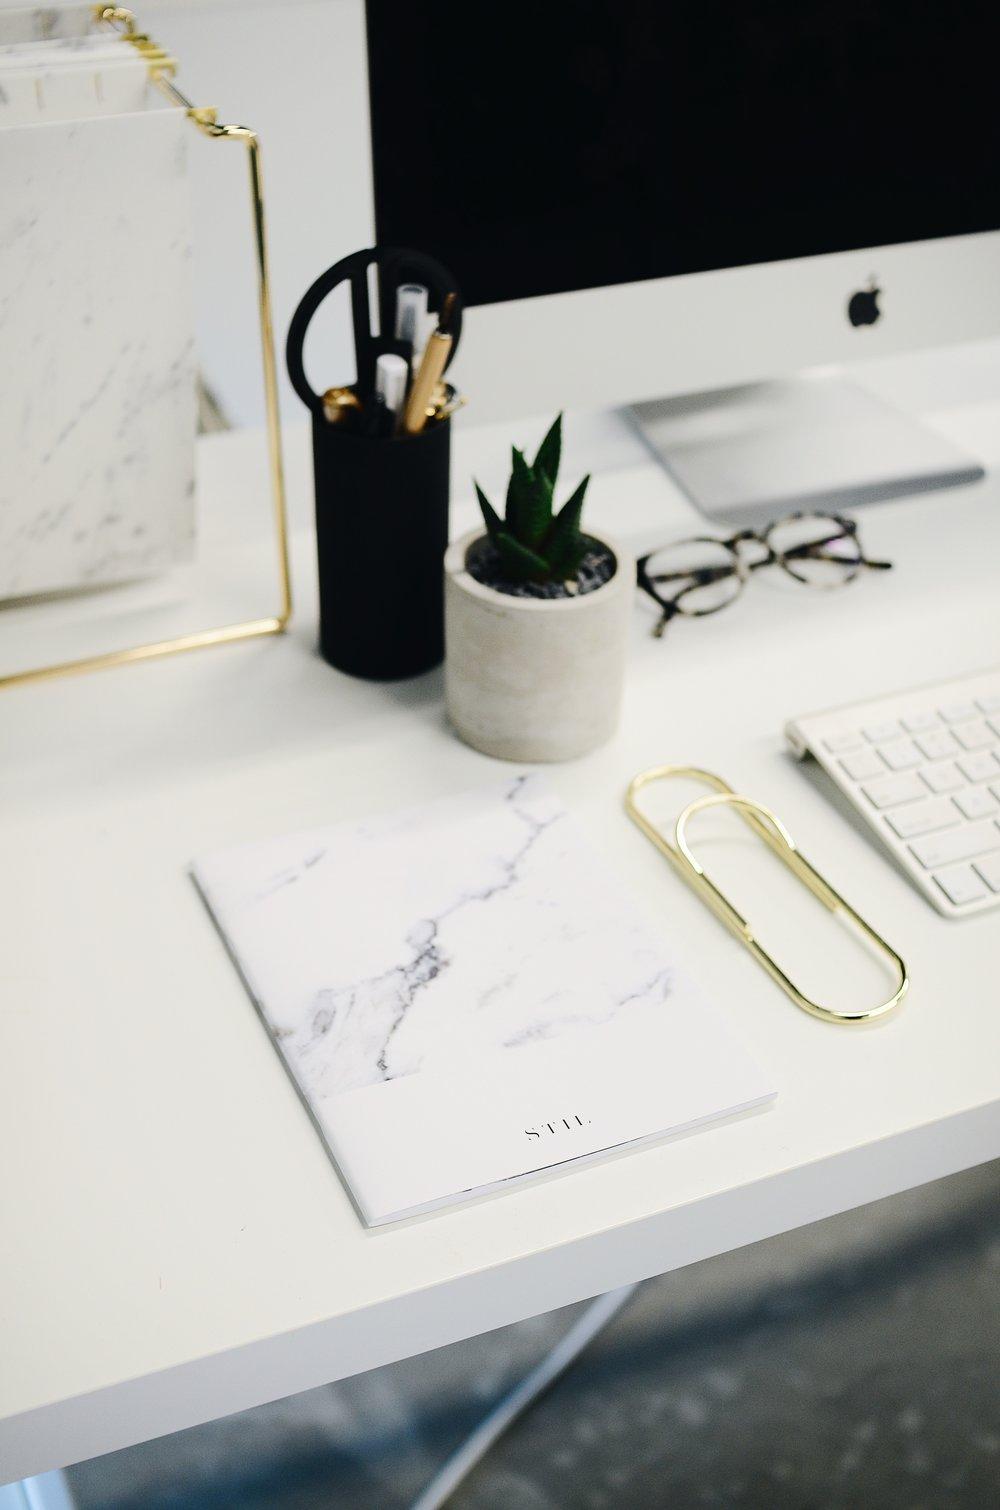 Fleursociety Best Practices for Consultations Webinar